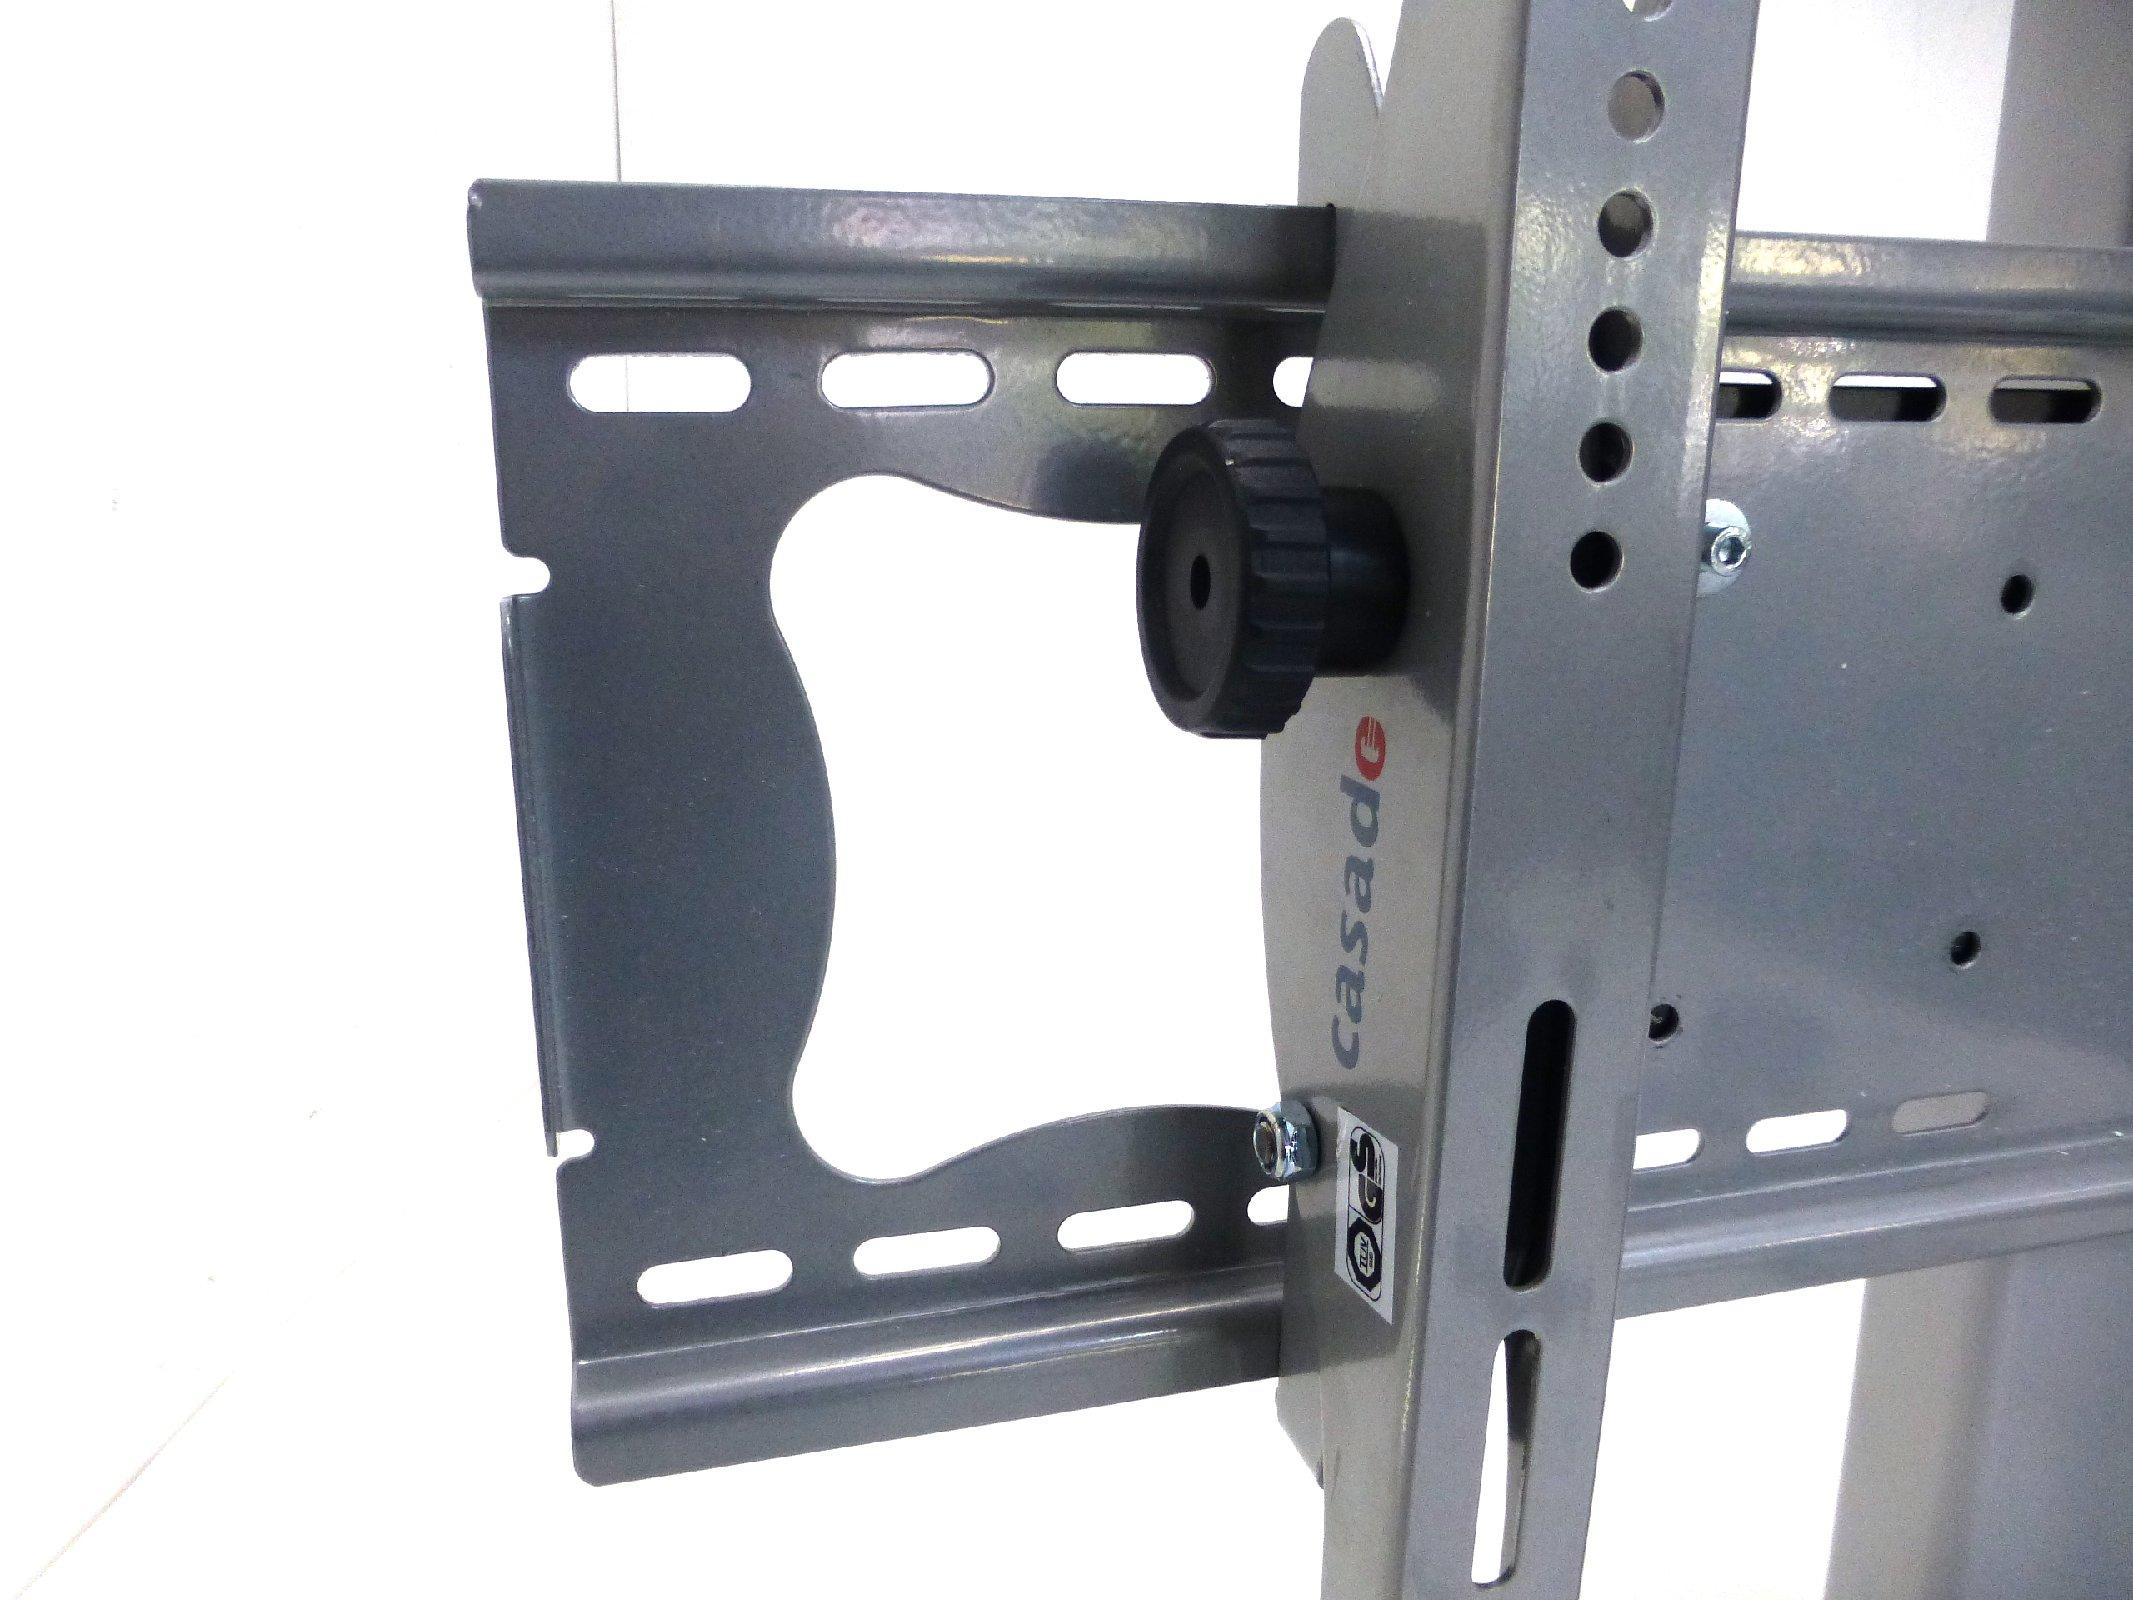 Elektrische wandhalterung flat lift led tv screen - Elektrische zahnburste mit wandhalterung ...